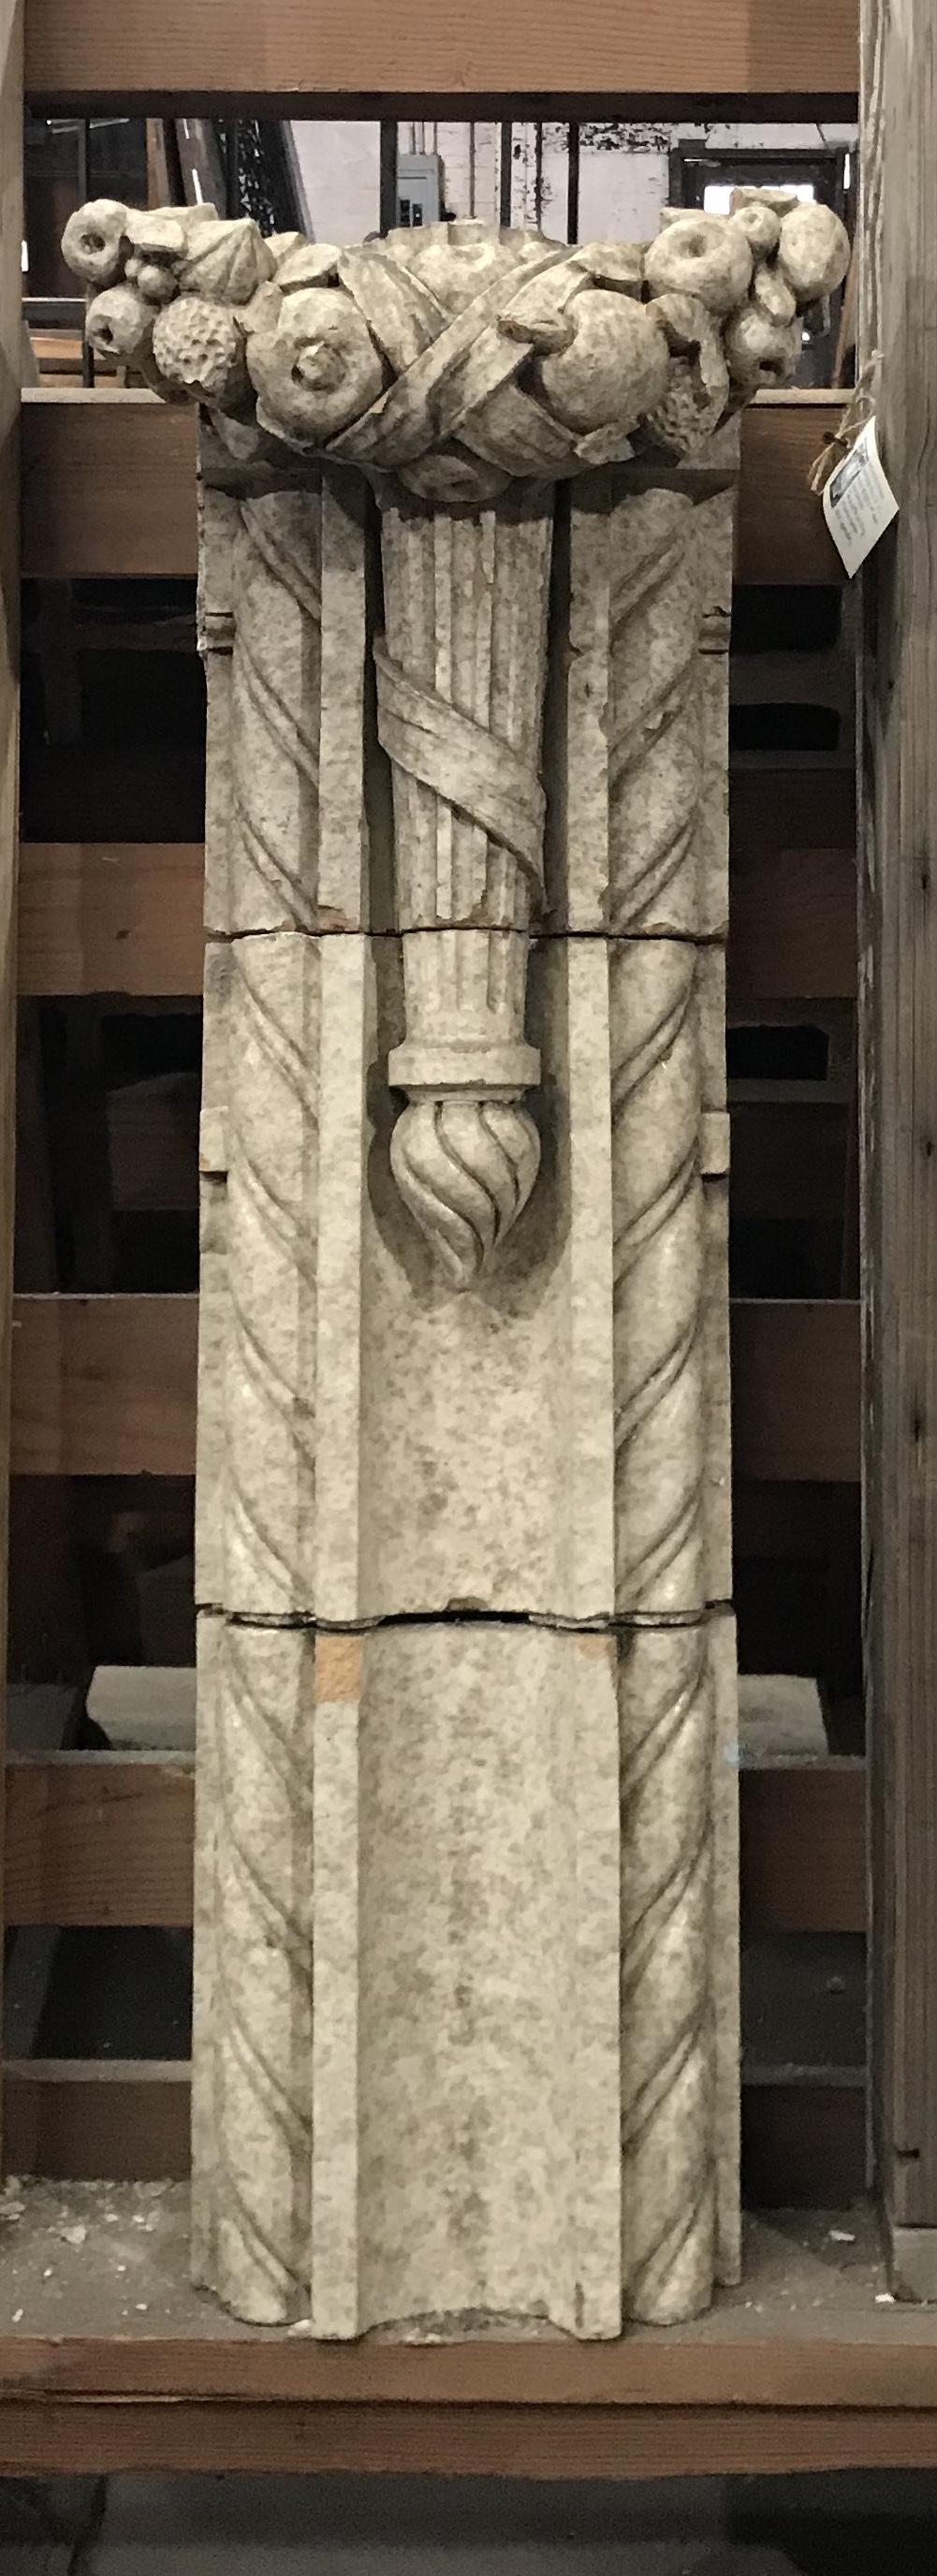 Terra cotta architectural salvage